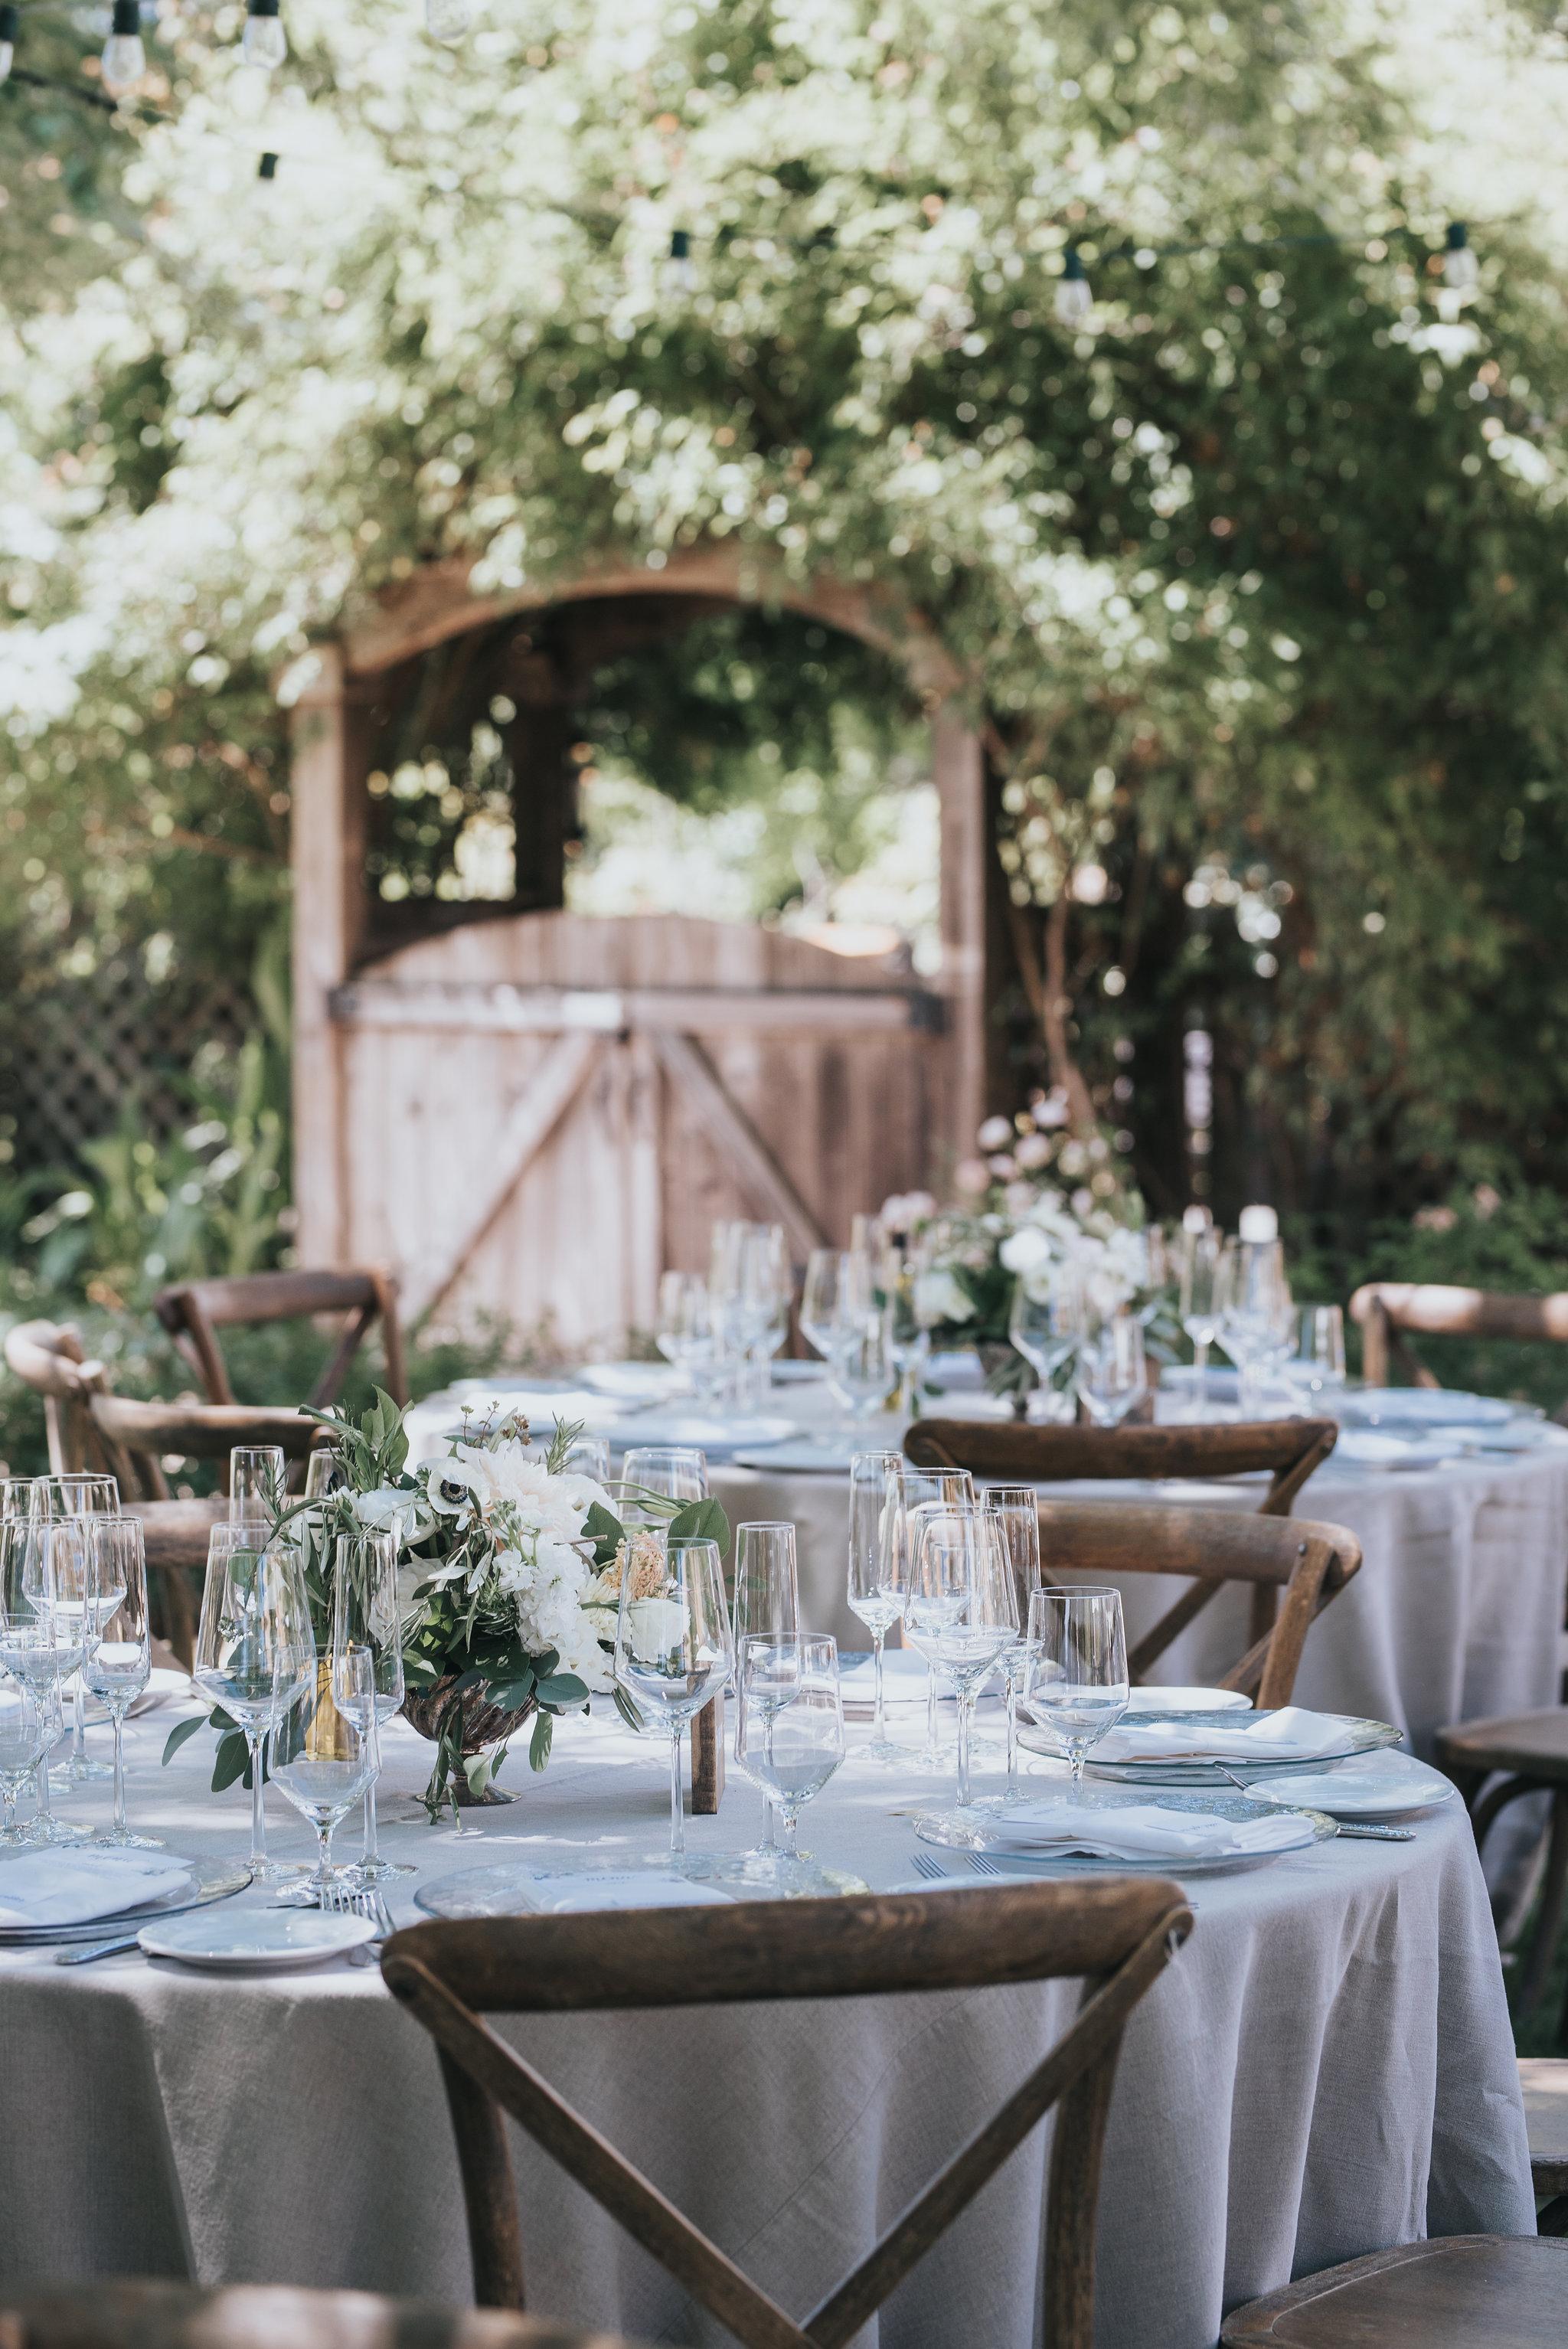 rus-farm-wedding-healdsburg-hwc-heald-wedding-consulting-dining-bistro.tuscany-la-tavola.jpg